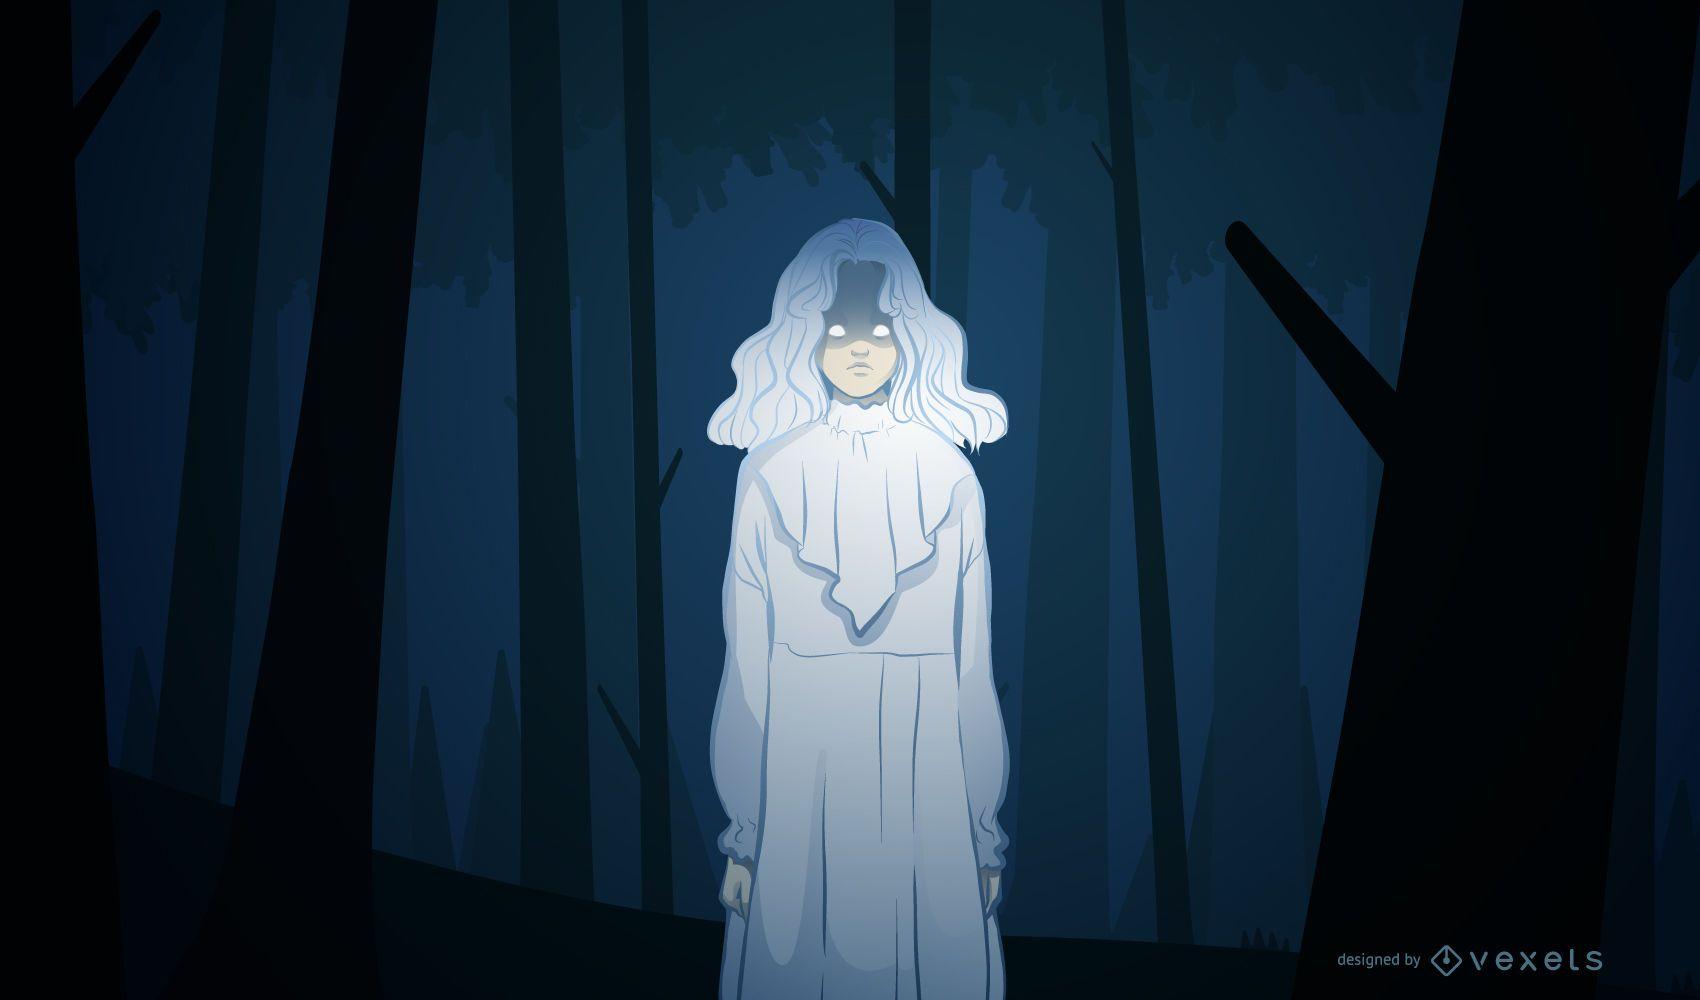 Creepy girl halloween illustration